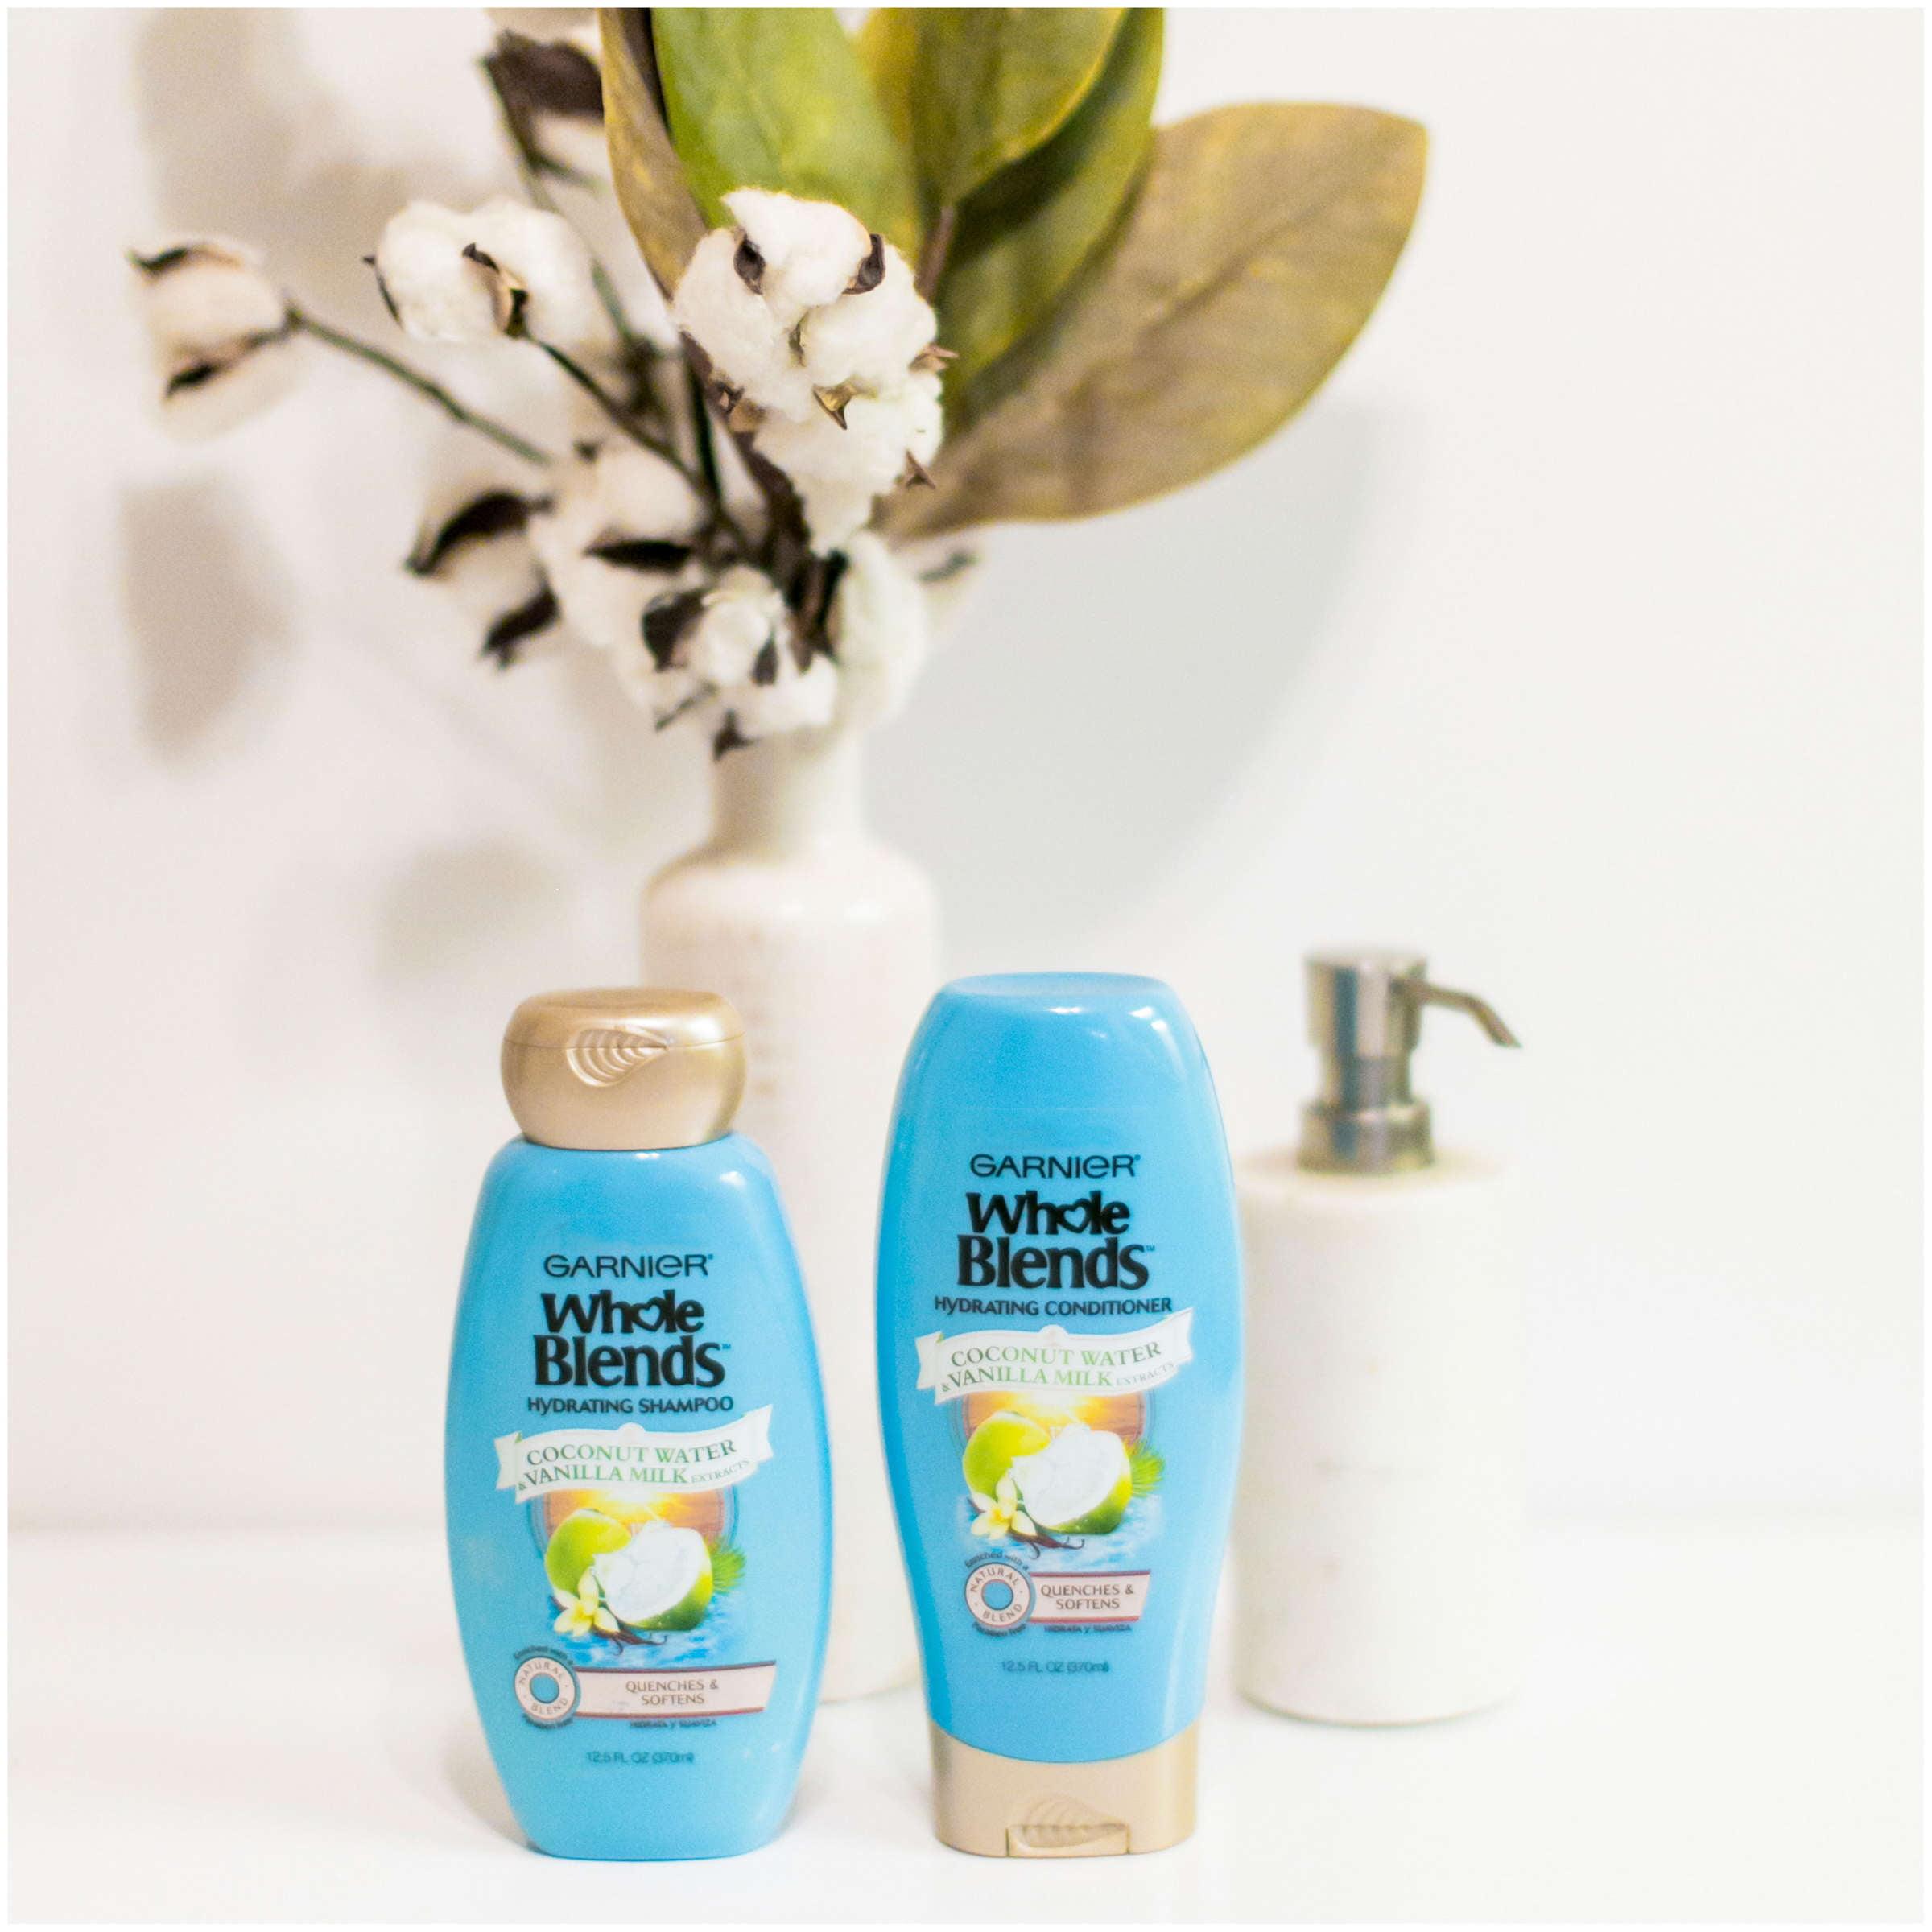 Garnier Whole Blends Shampoo with Coconut Water & Vanilla Milk Extracts  12 5 FL OZ